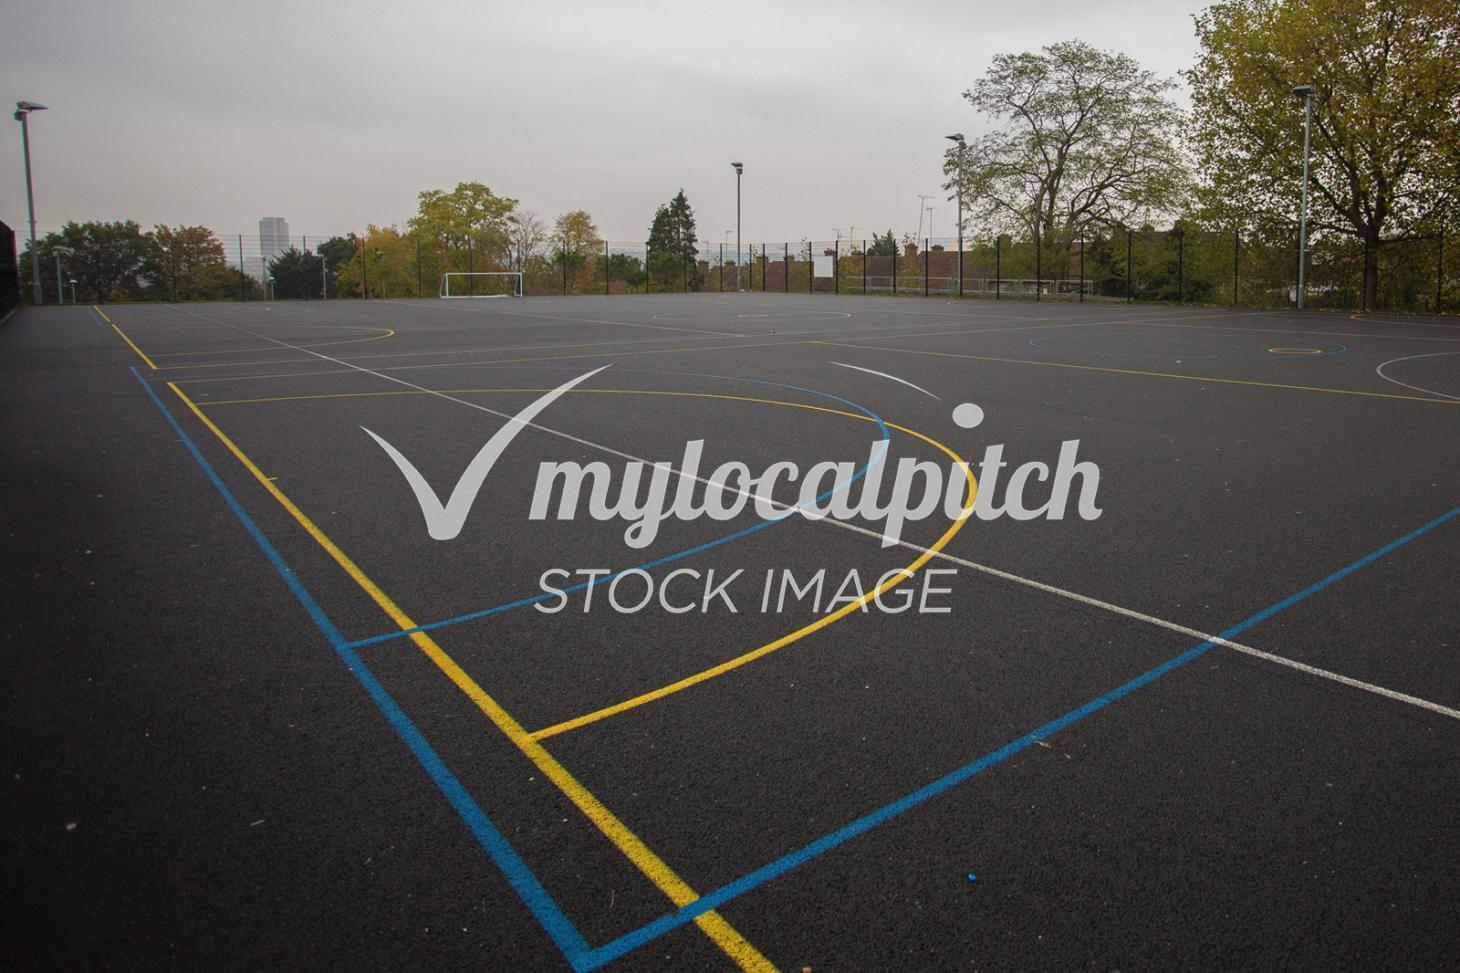 Gladstone Park Outdoor | Concrete netball court